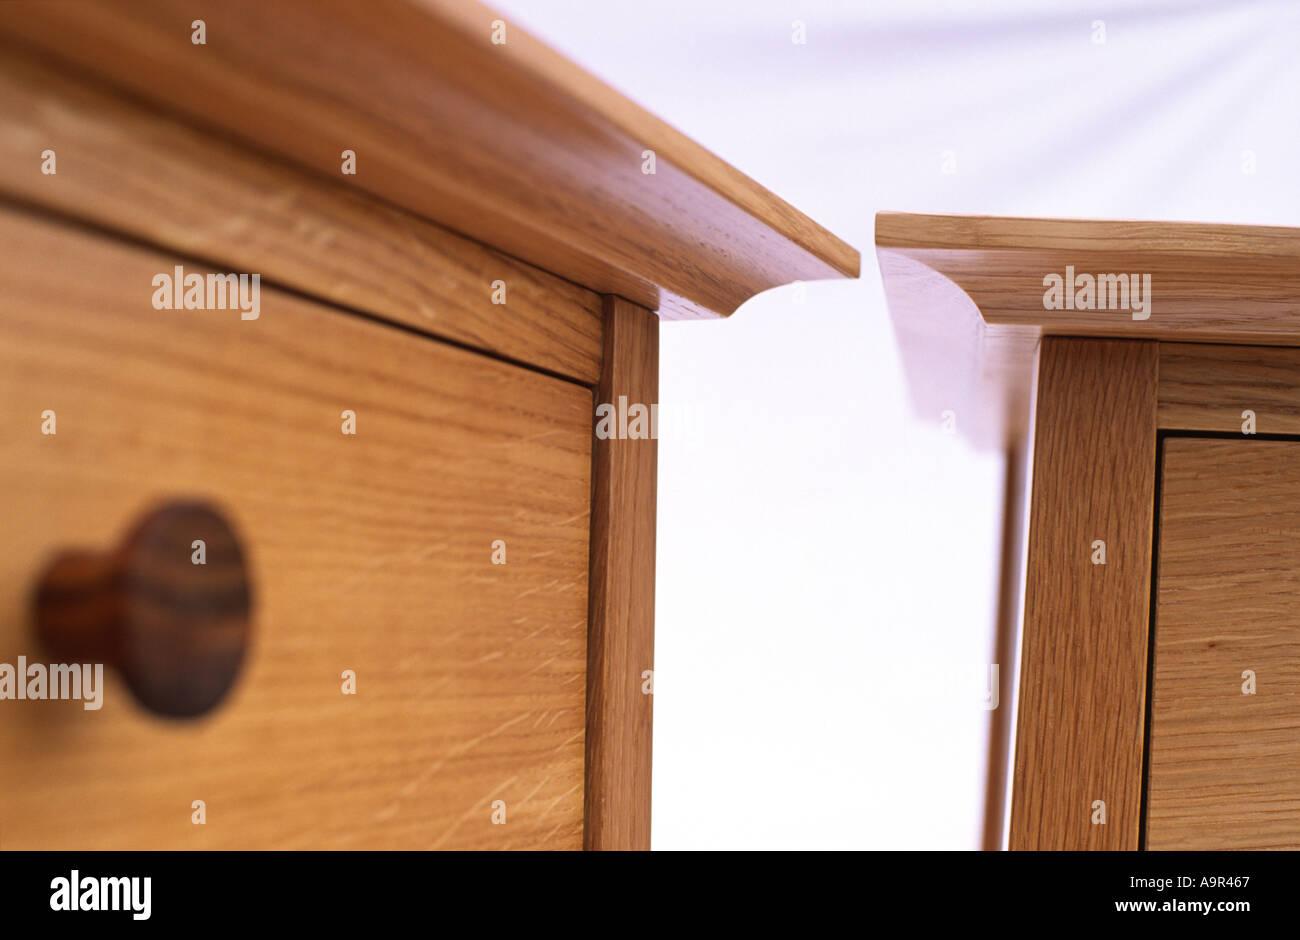 Hand Made Light Oak Furniture Cabinets Still Life - Stock Image